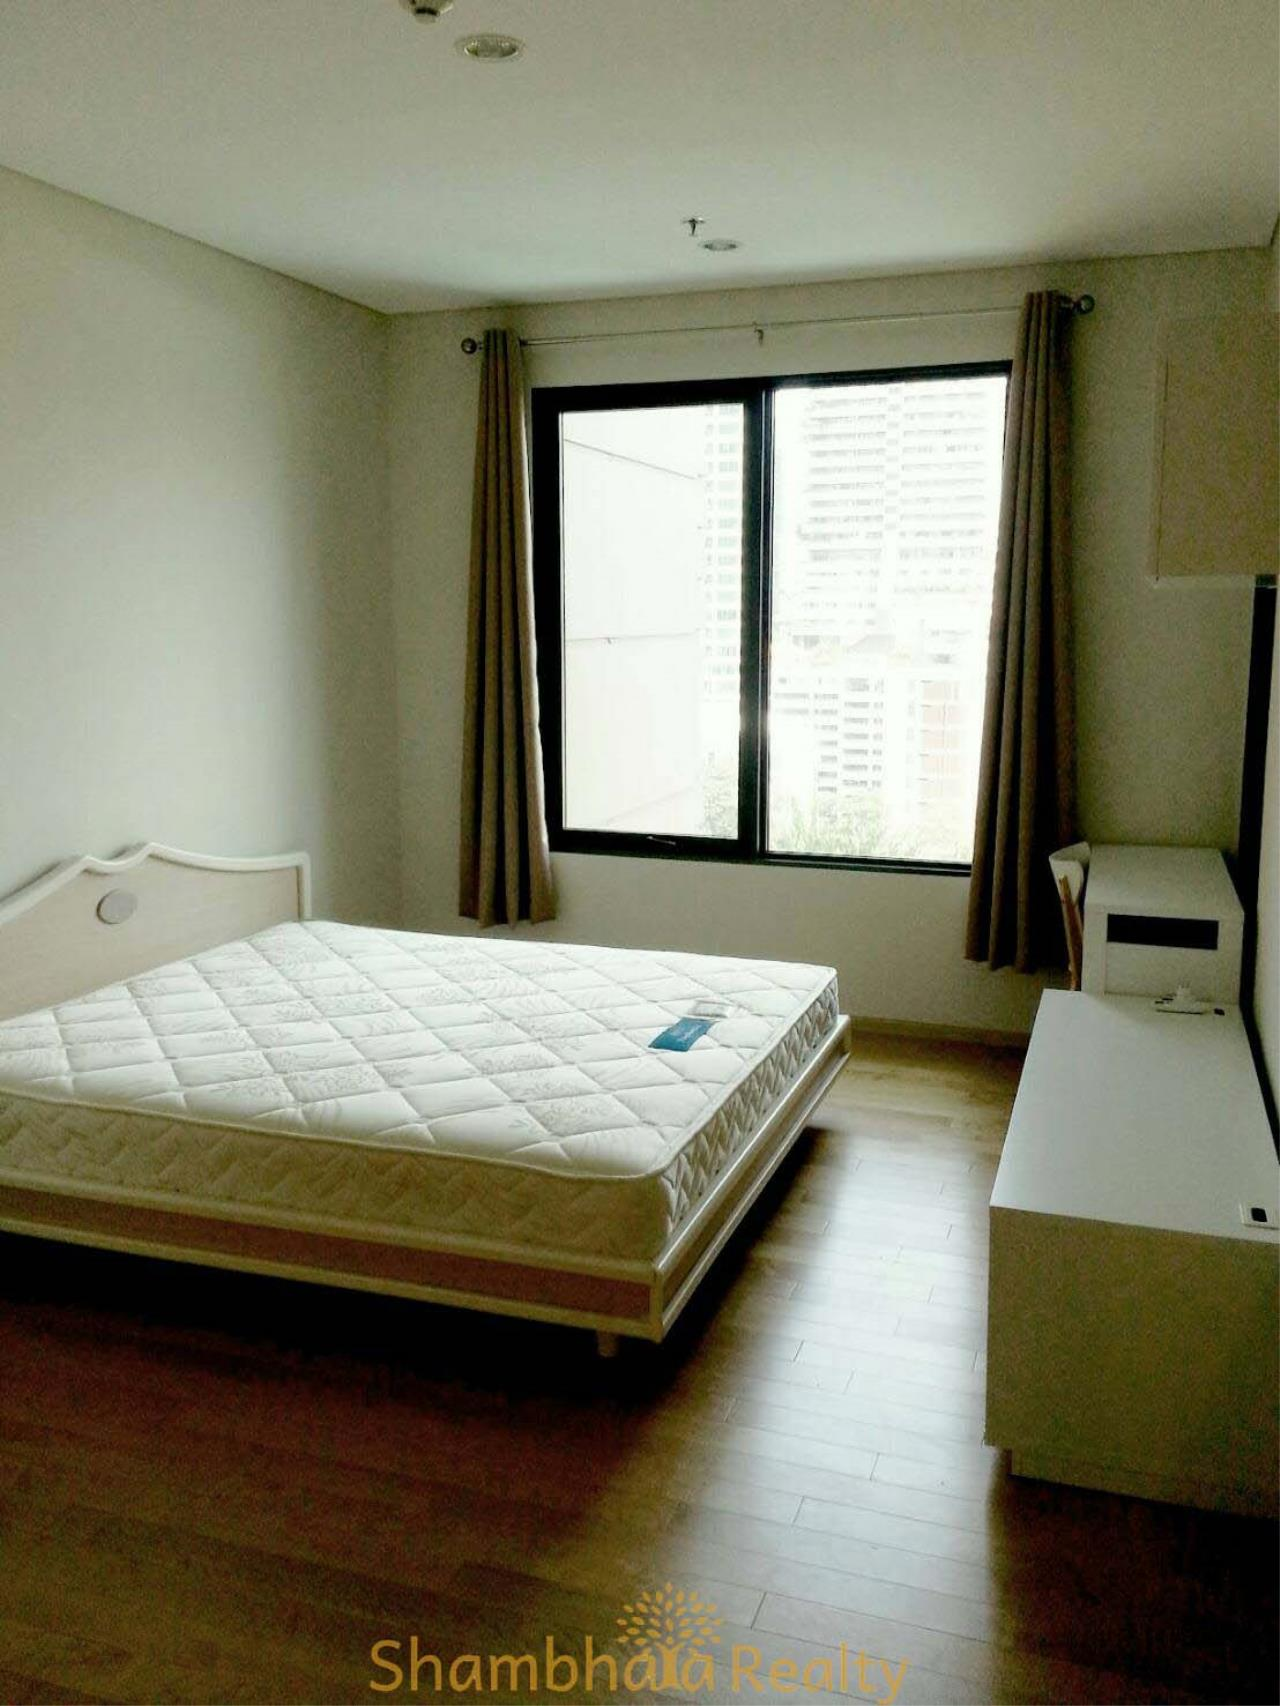 Shambhala Realty Agency's Villa Asoke Condominium for Rent in New Phetchaburi 6